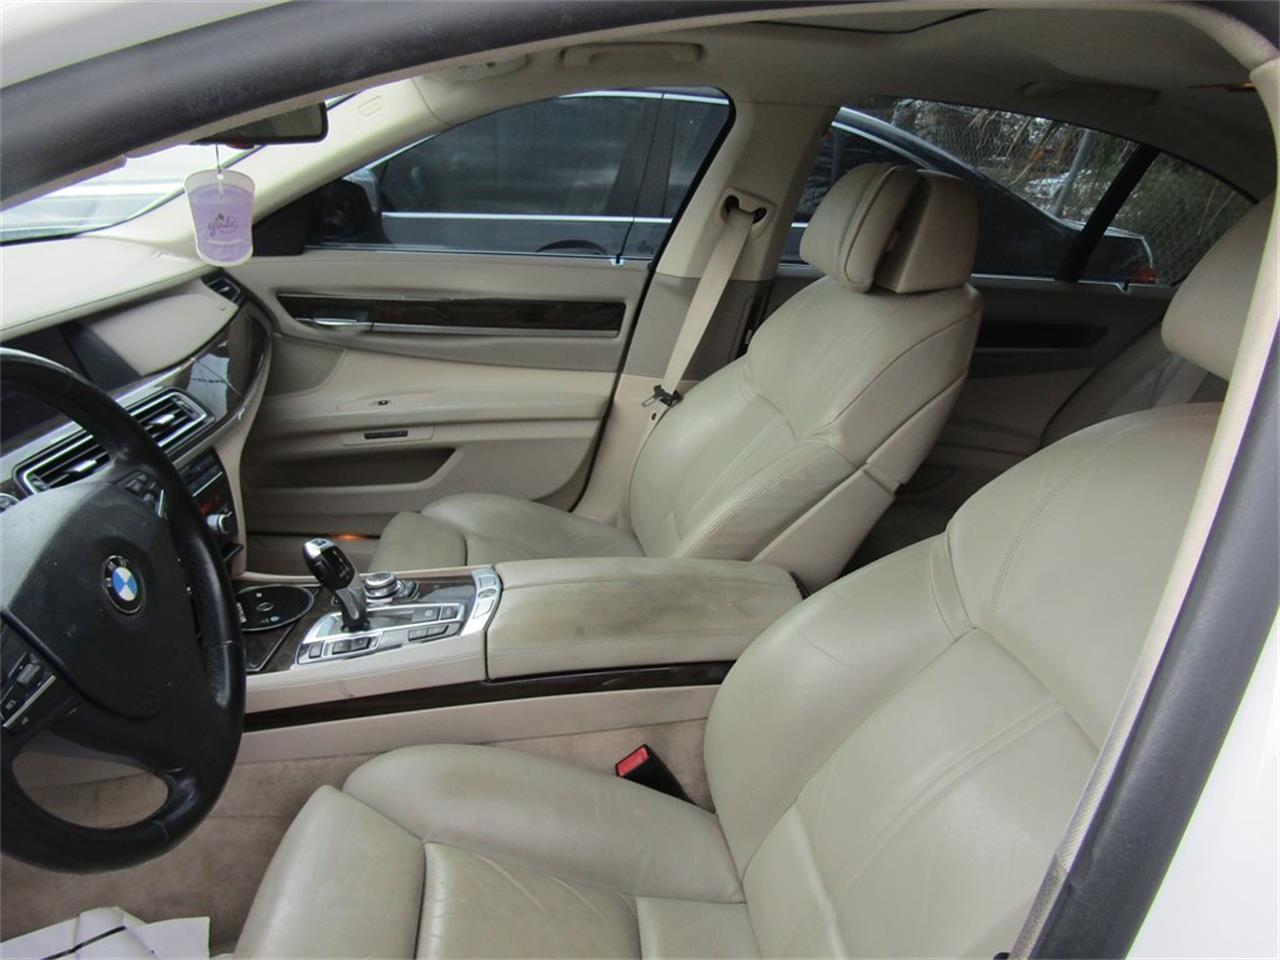 2010 BMW 7 Series (CC-1296448) for sale in Orlando, Florida